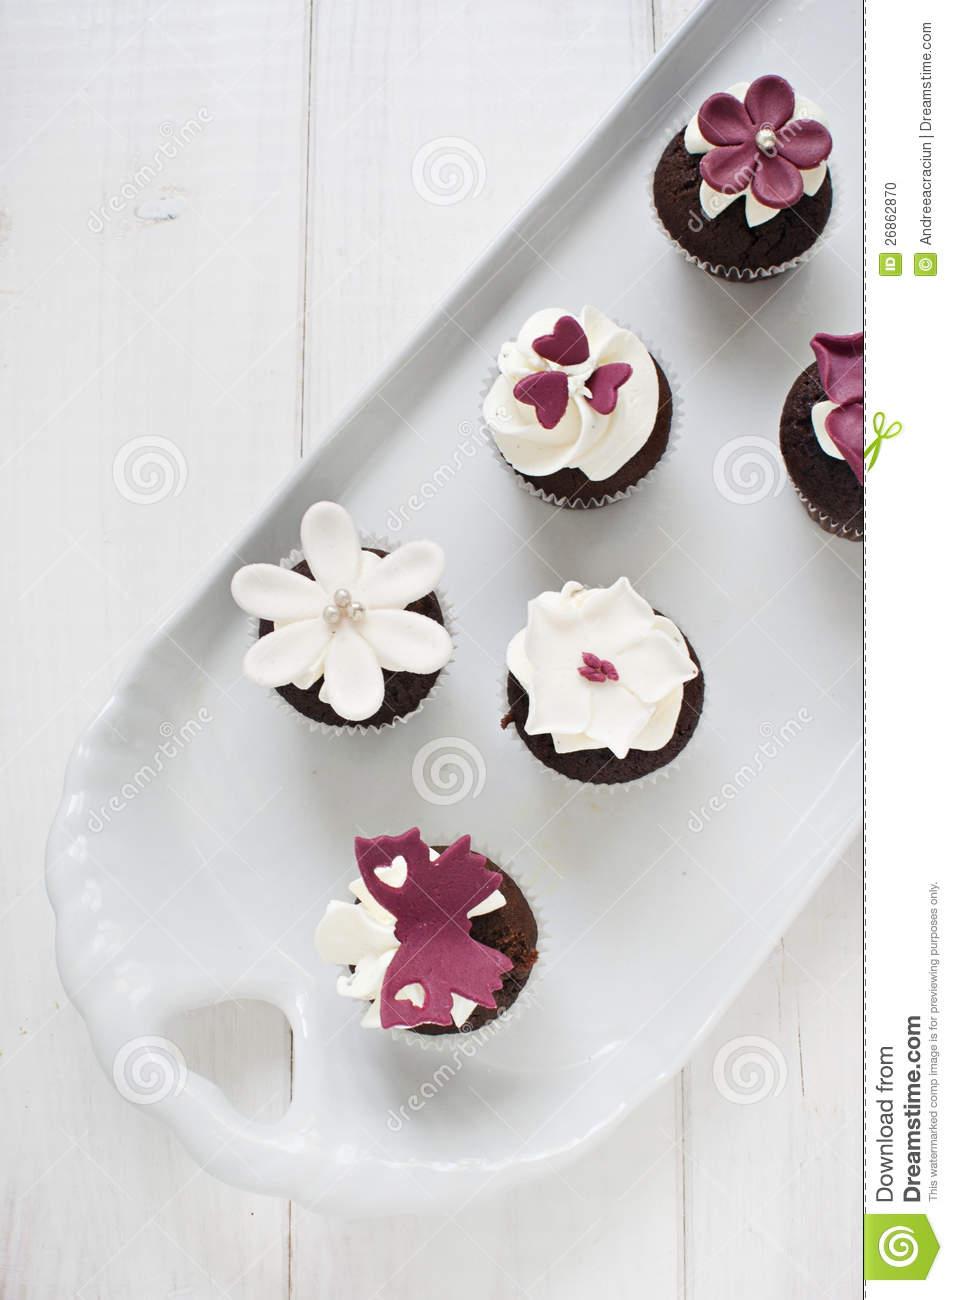 Wedding Cupcakes with Fondant Flowers